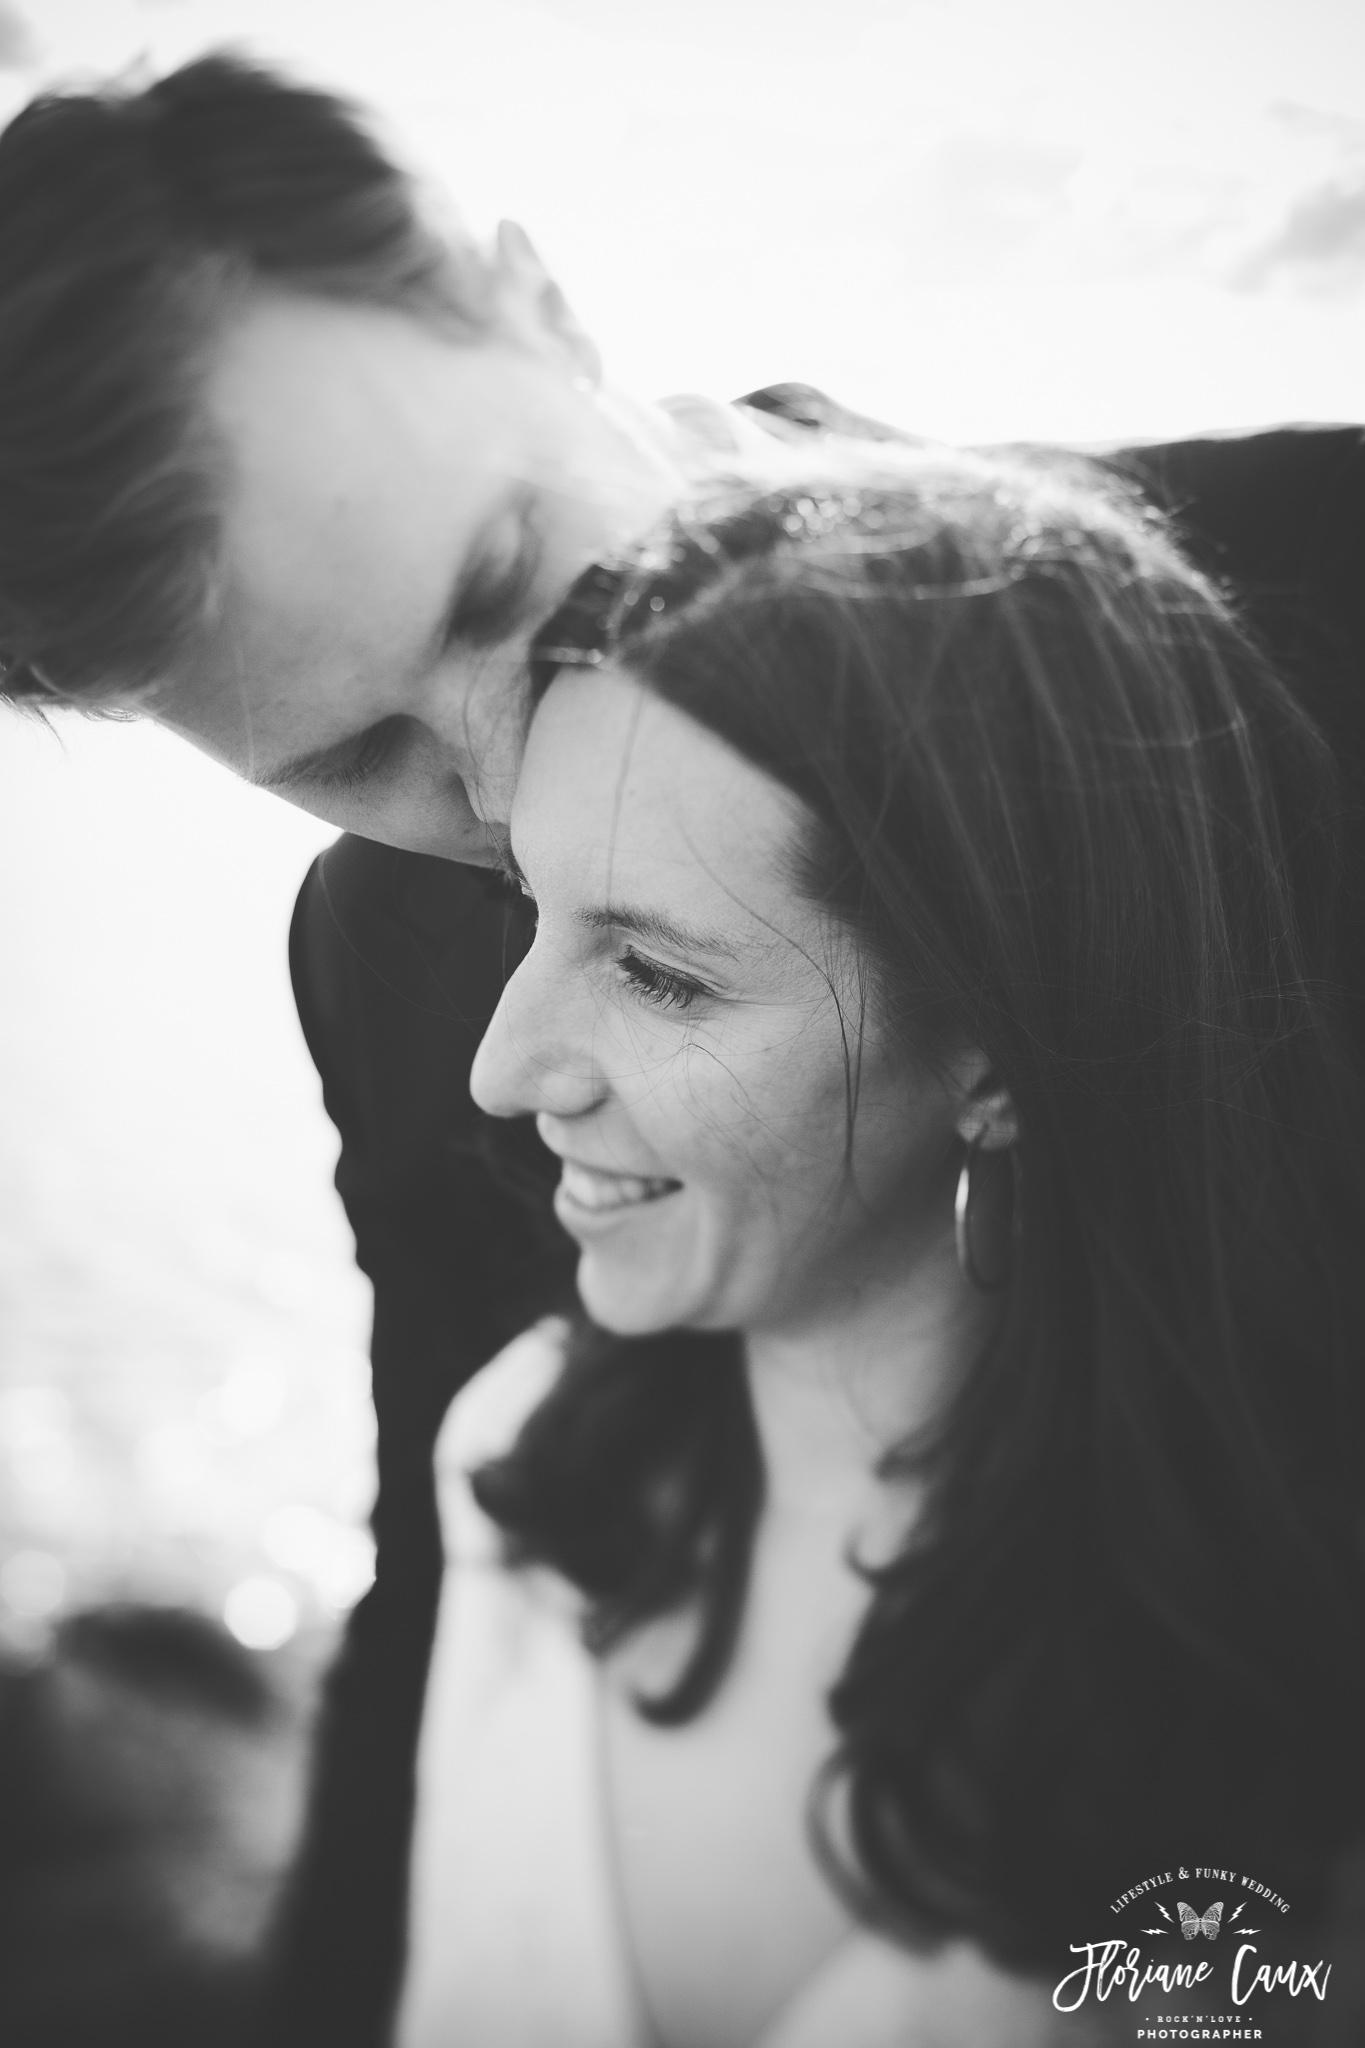 destination-wedding-photographer-oslo-norway-floriane-caux-74